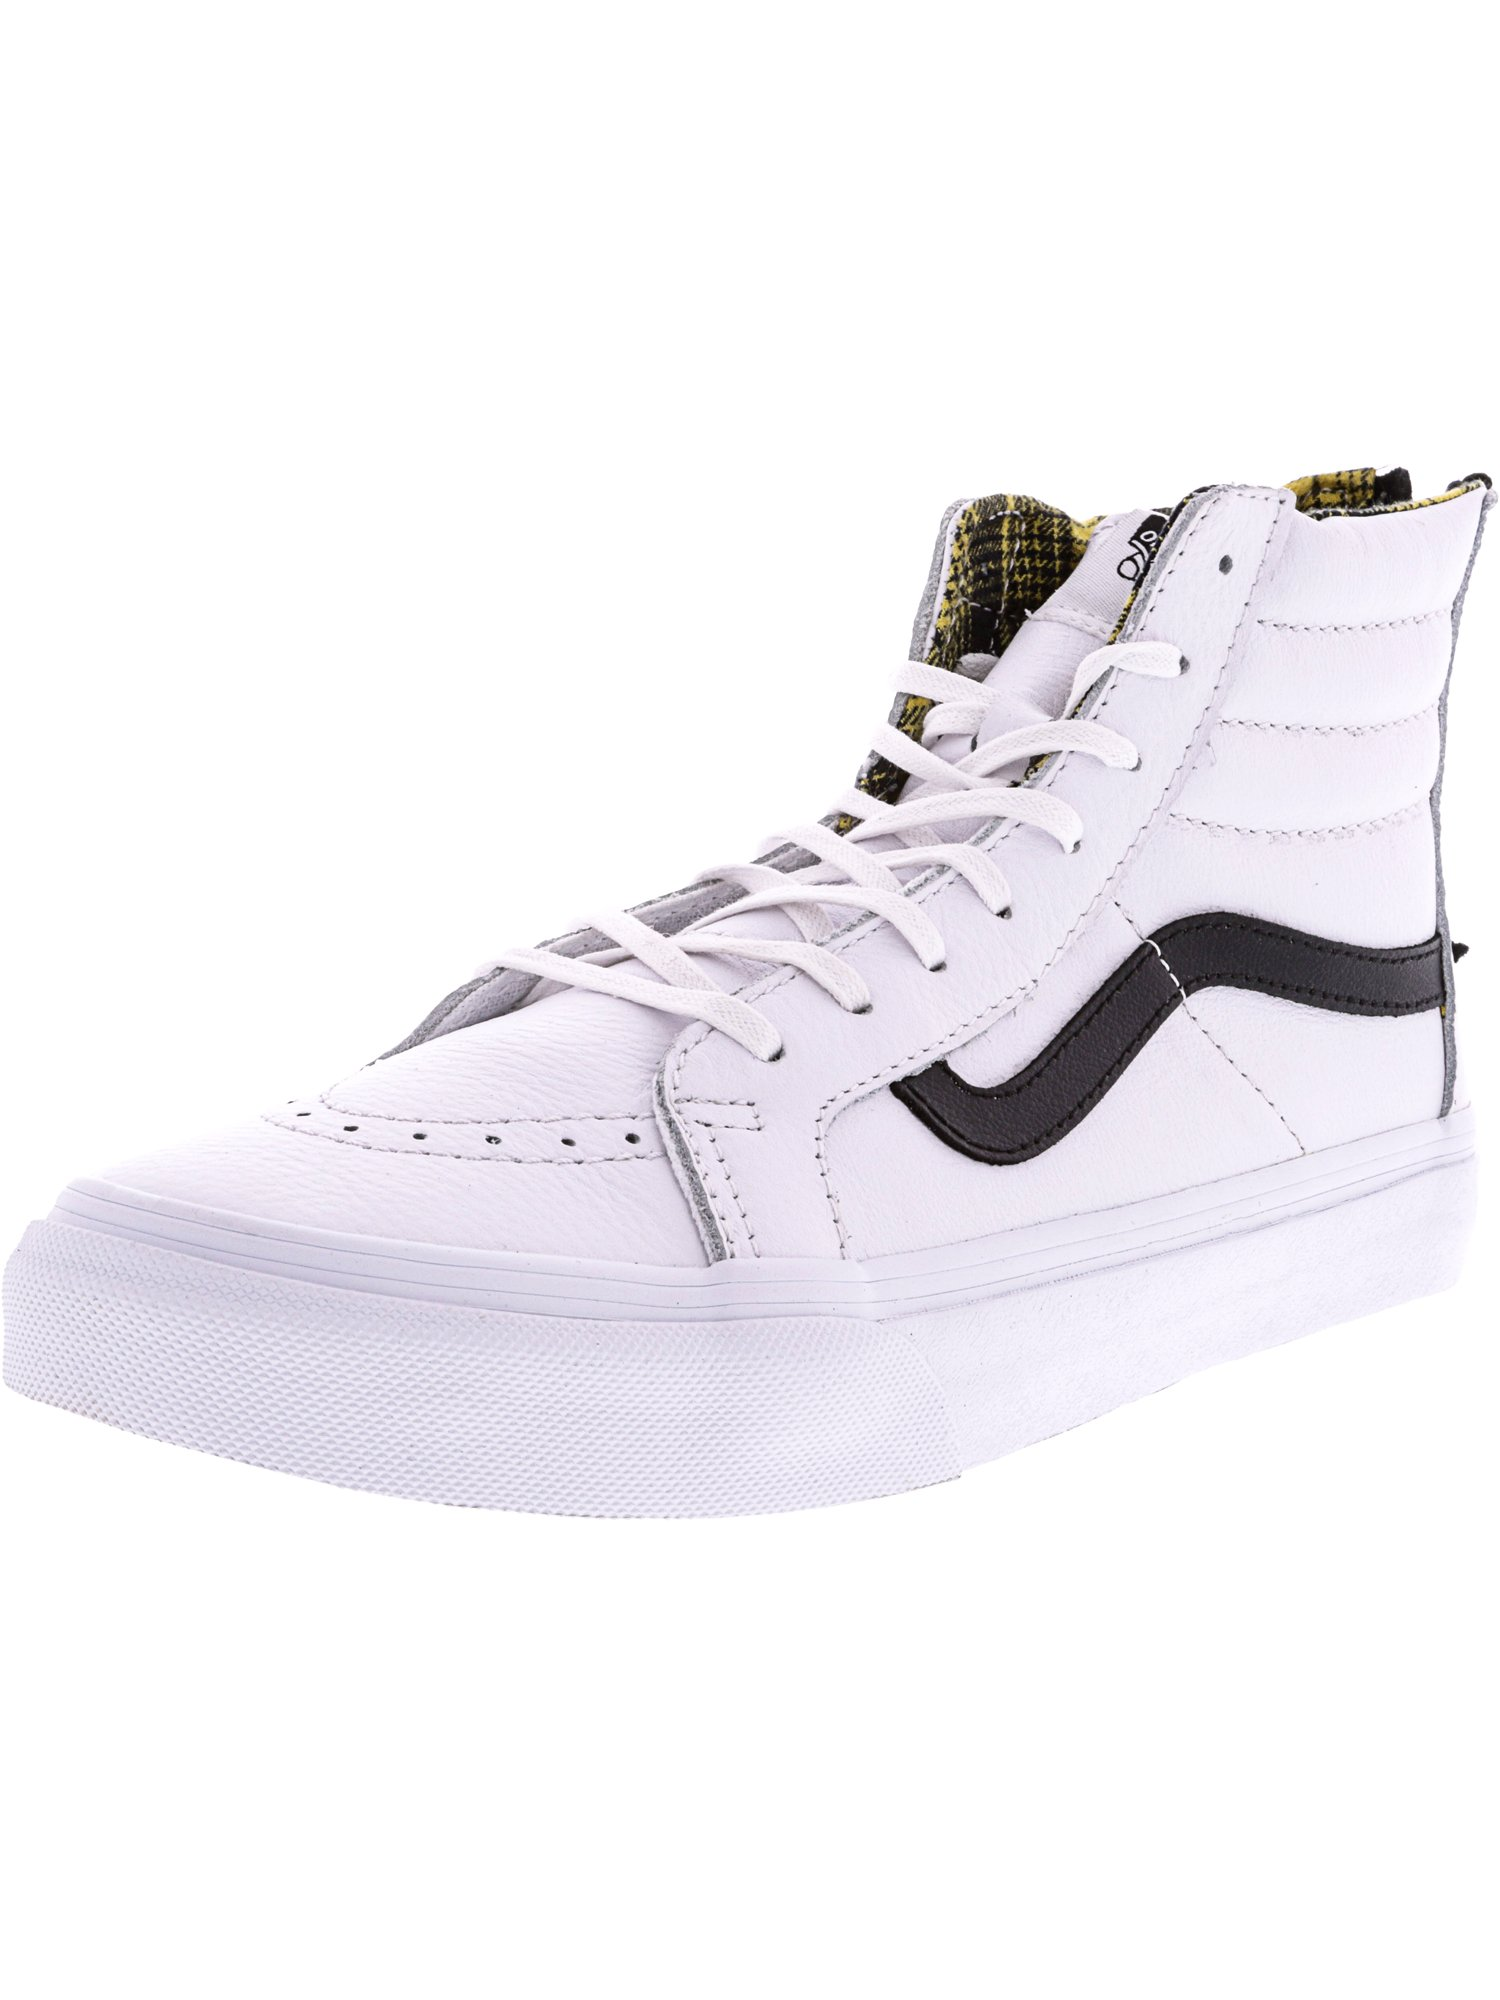 1c8b9ed0e46b Vans Sk8-Hi Slim Zip Plaid Flannel True White   Black High-Top Leather  Skateboarding Shoe - 9.5M 8M - Walmart.com